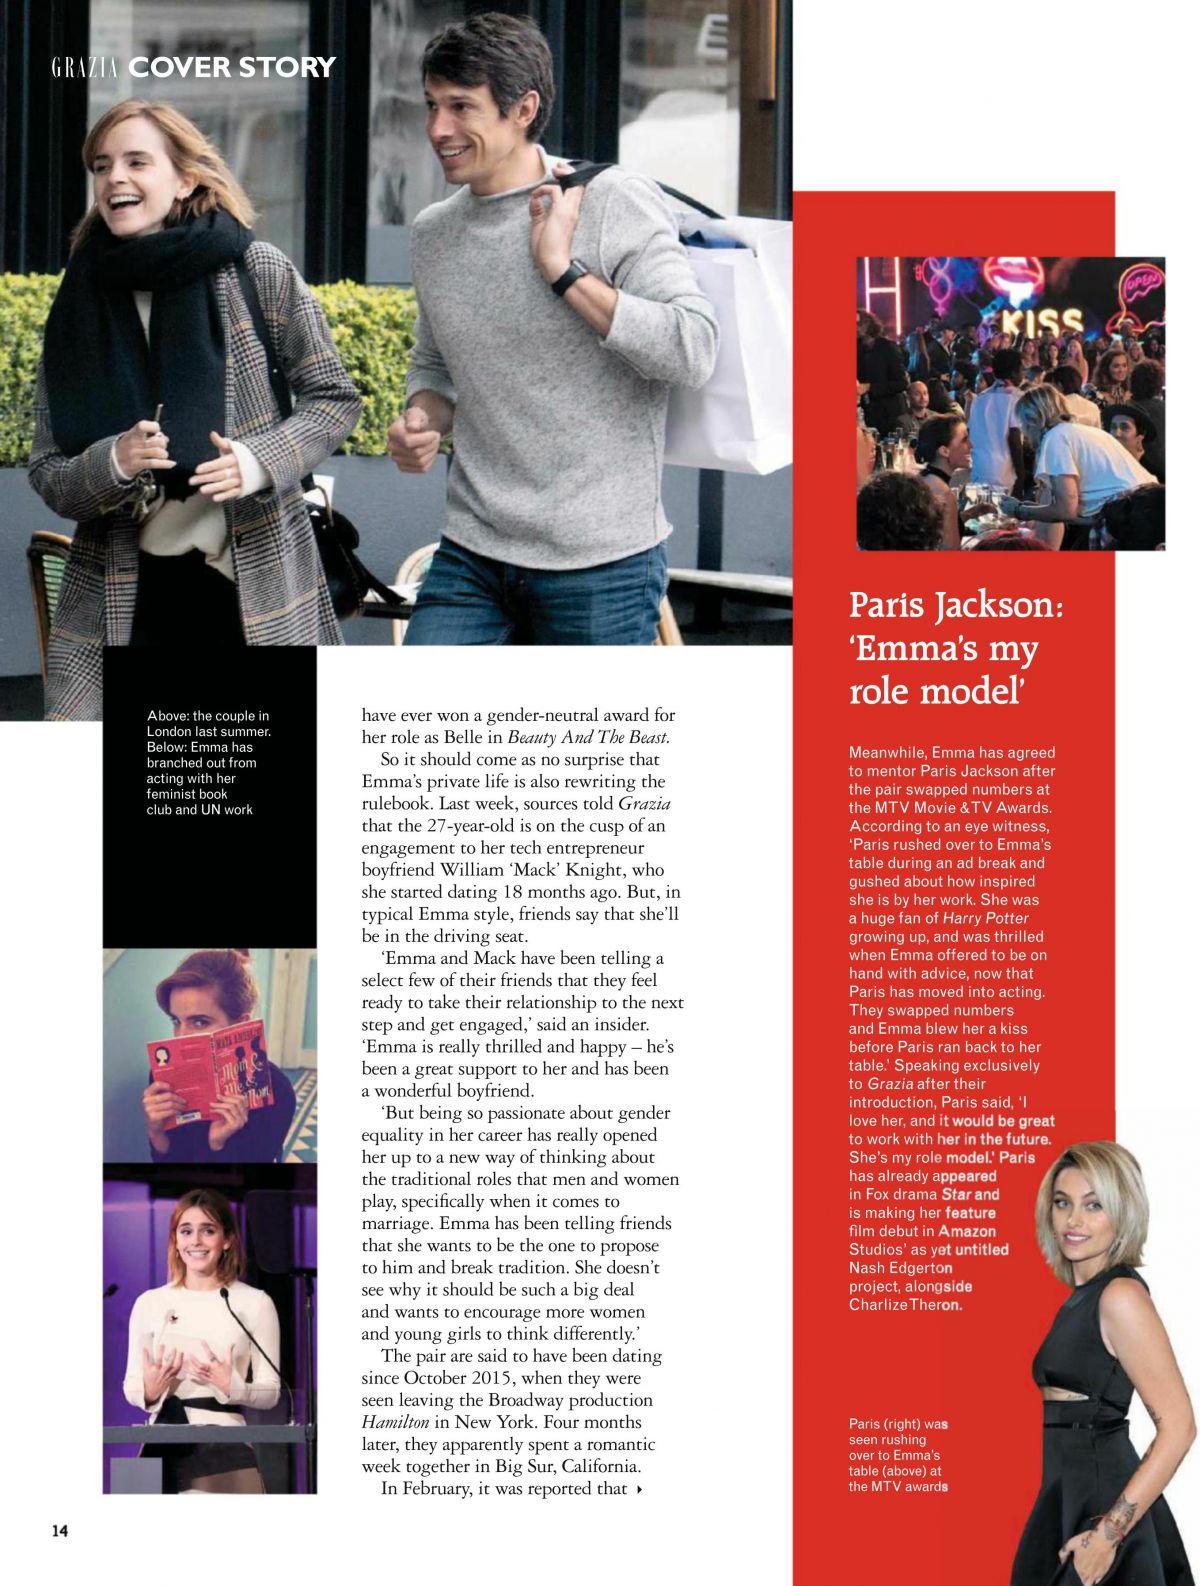 EMMA WATSON in Grazia Magazine May 2017